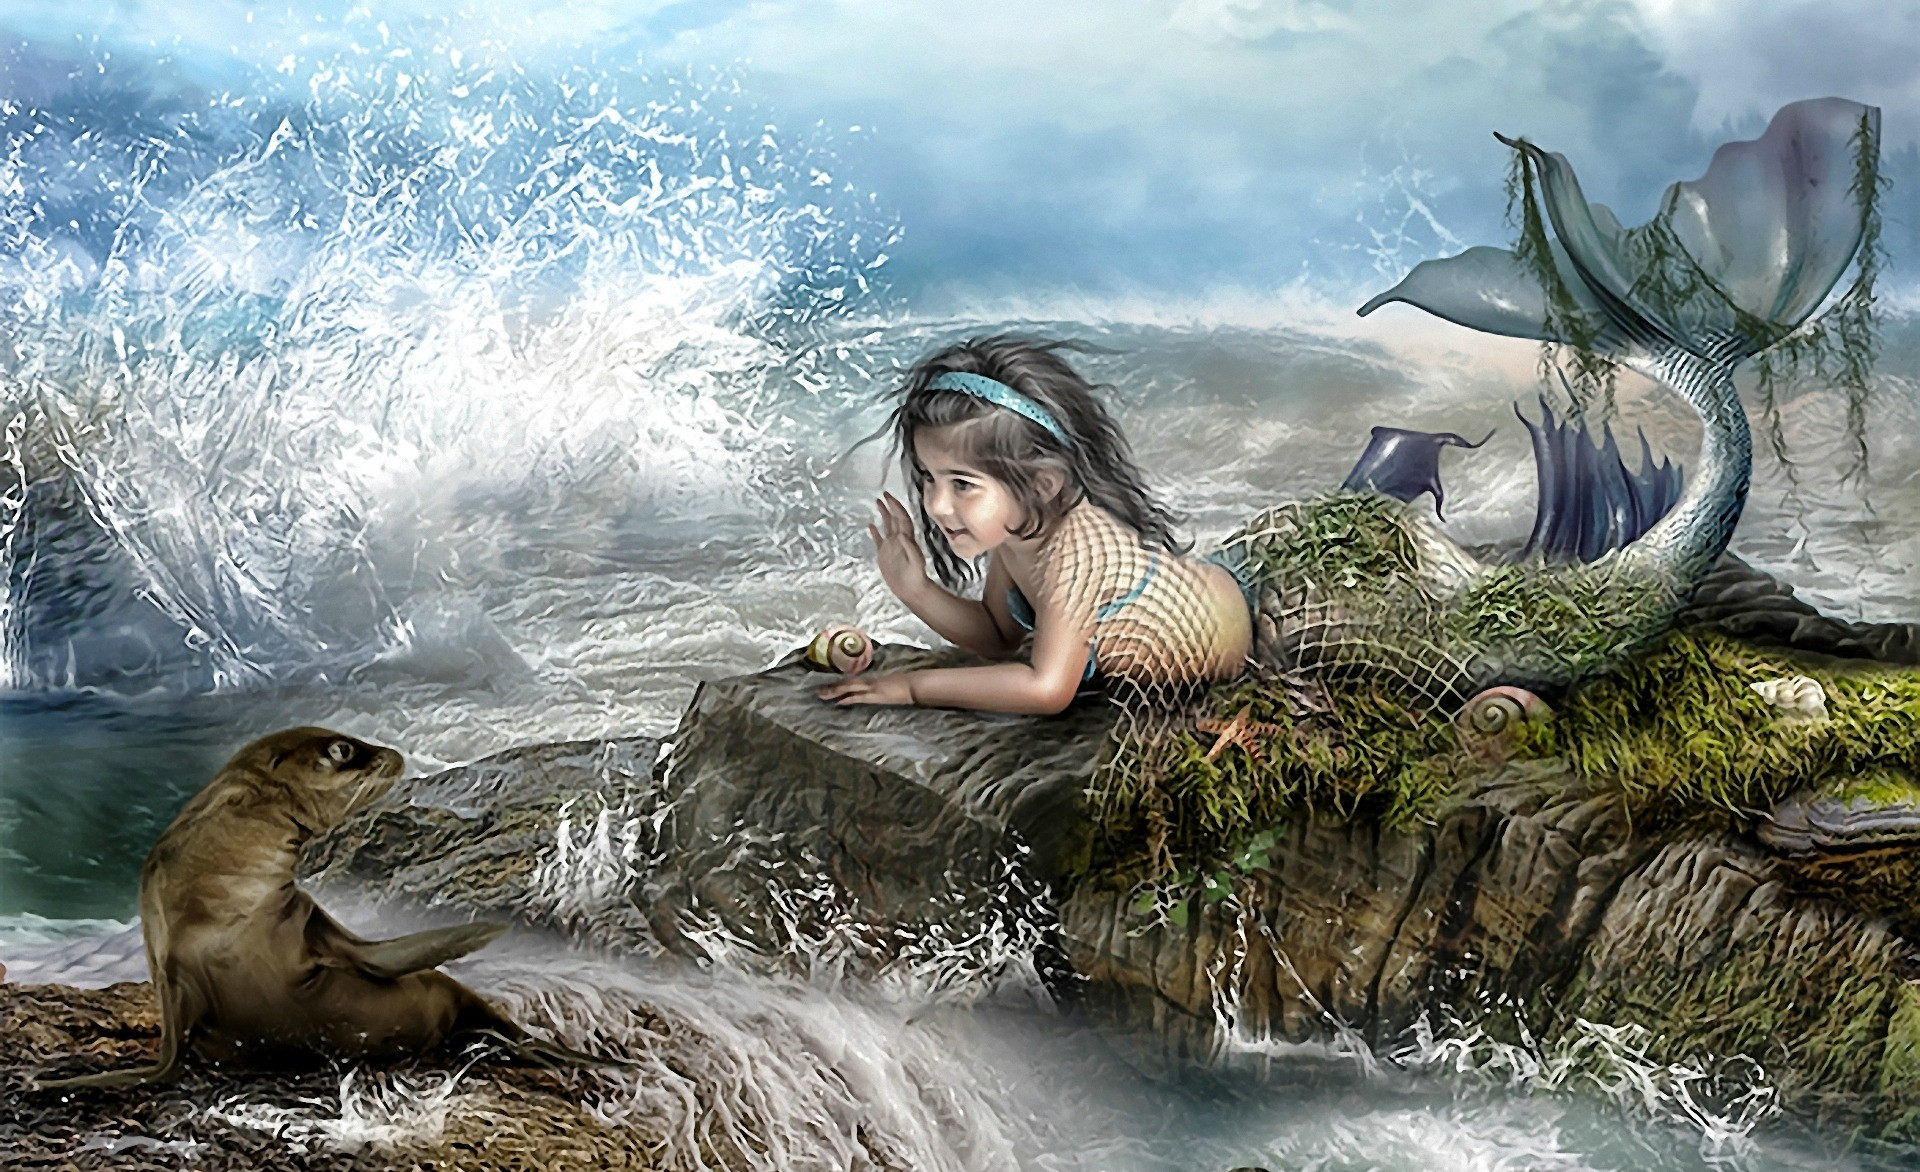 fantasy mermaid Wallpaper Backgrounds